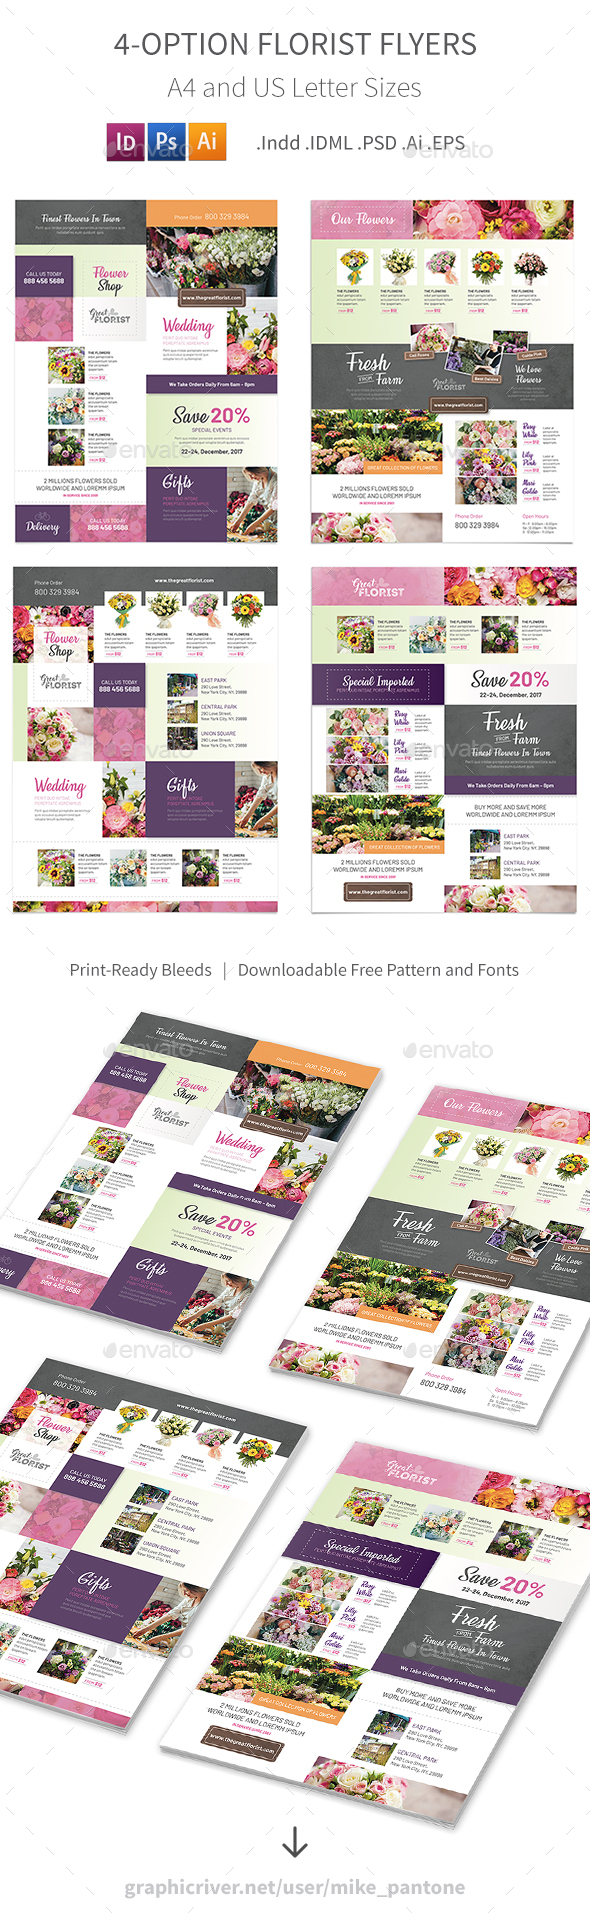 GraphicRiver Florist Flyers 3 4 Options 21060793